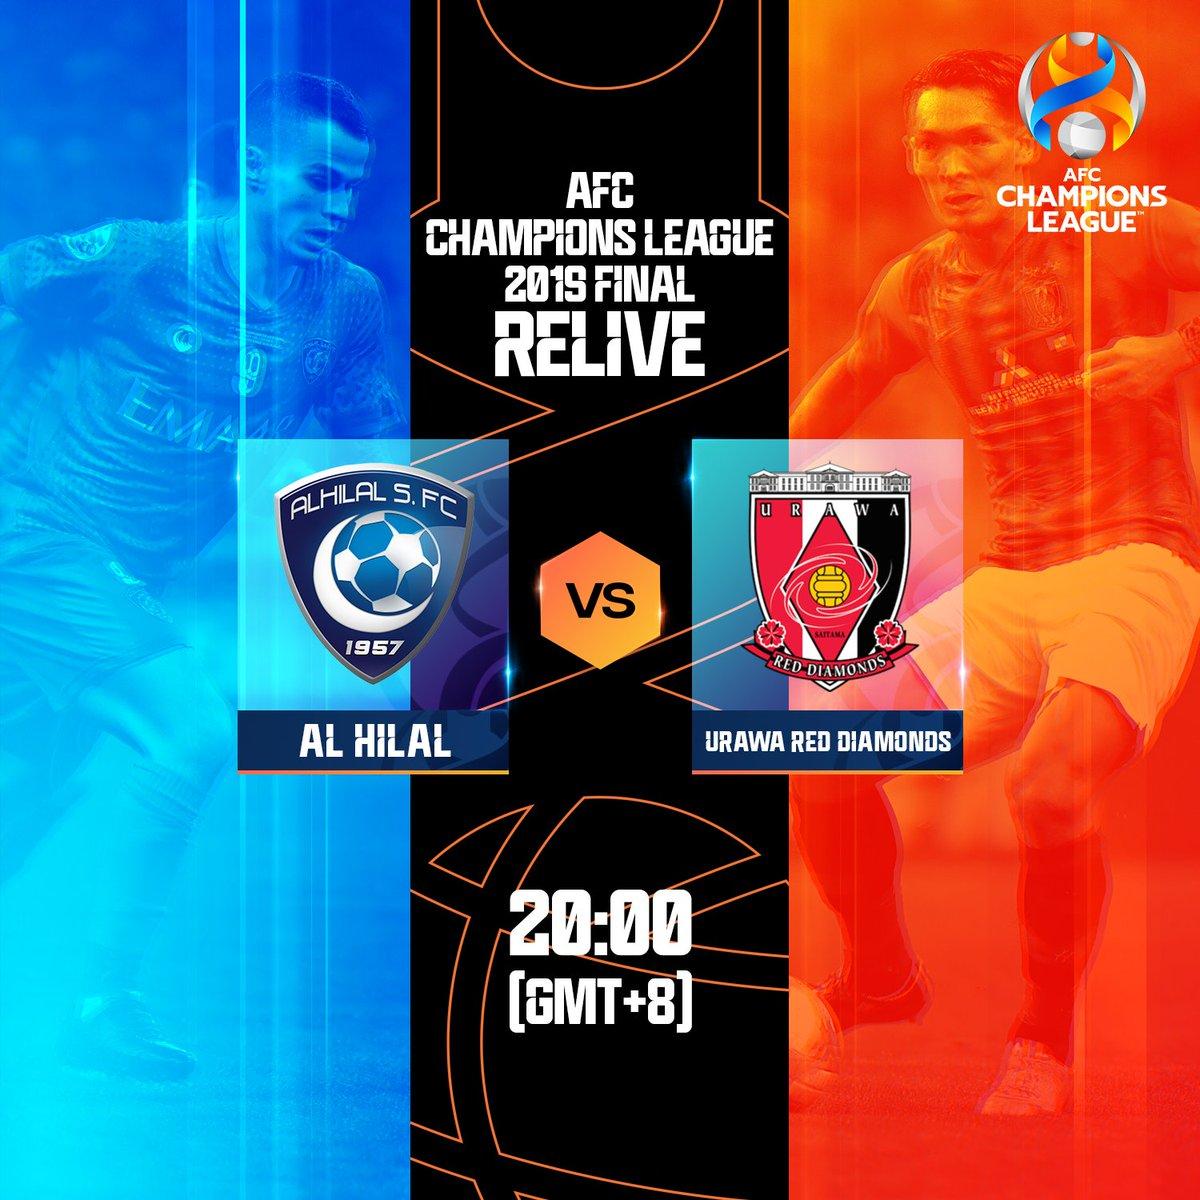 📺 ACL Final 2019 Relive   🇯🇵 Urawa Red Diamonds 🆚 Al Hilal 🇸🇦 ⏰ 20:00 (GMT+8) 📱Watch: